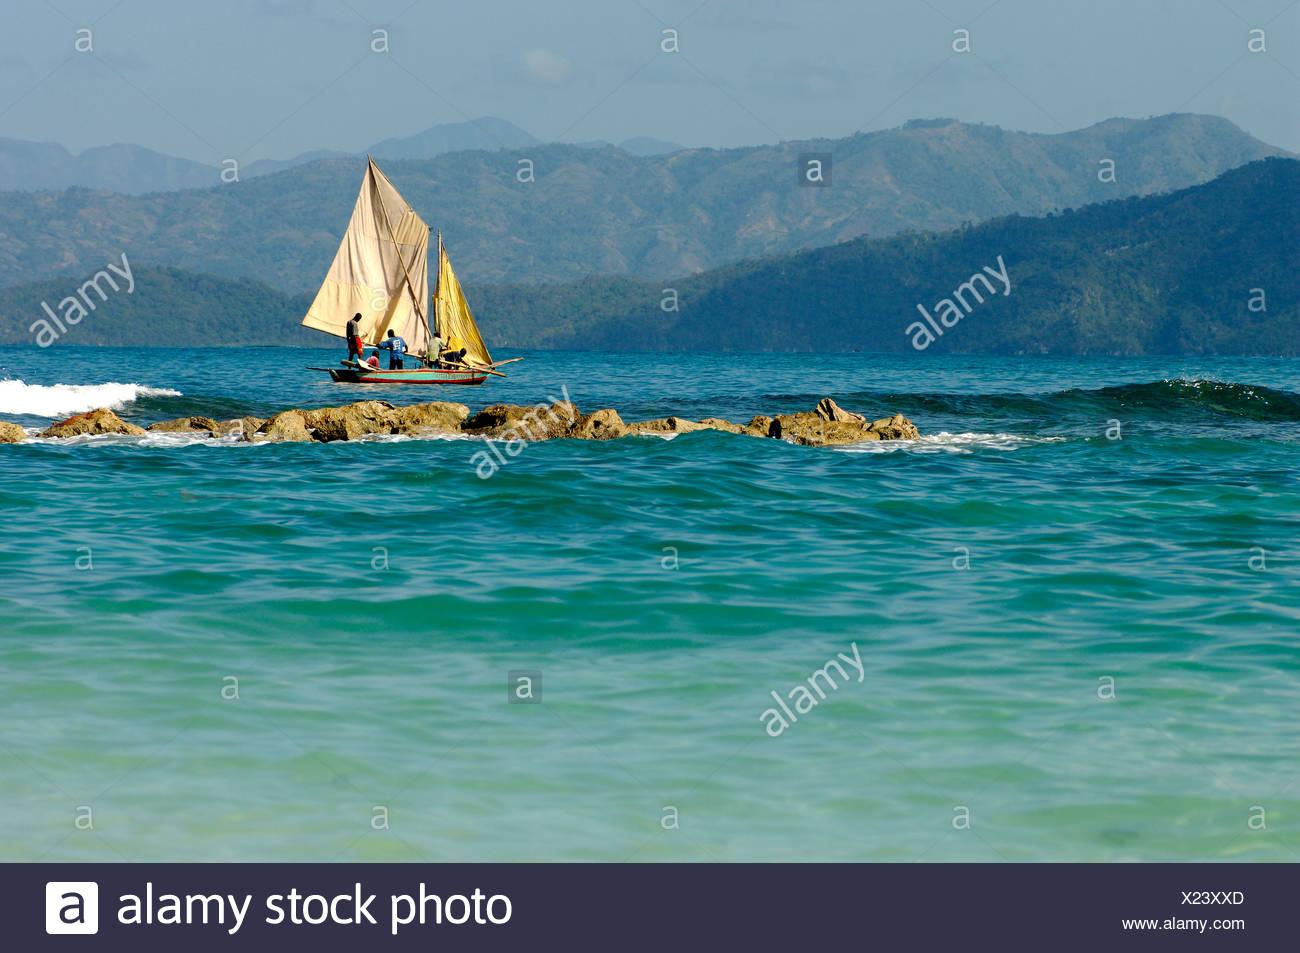 Haiti Labadee Caribbean Fishing Fisher Sailboat Boat Sea Ocean Coast - Stock Image